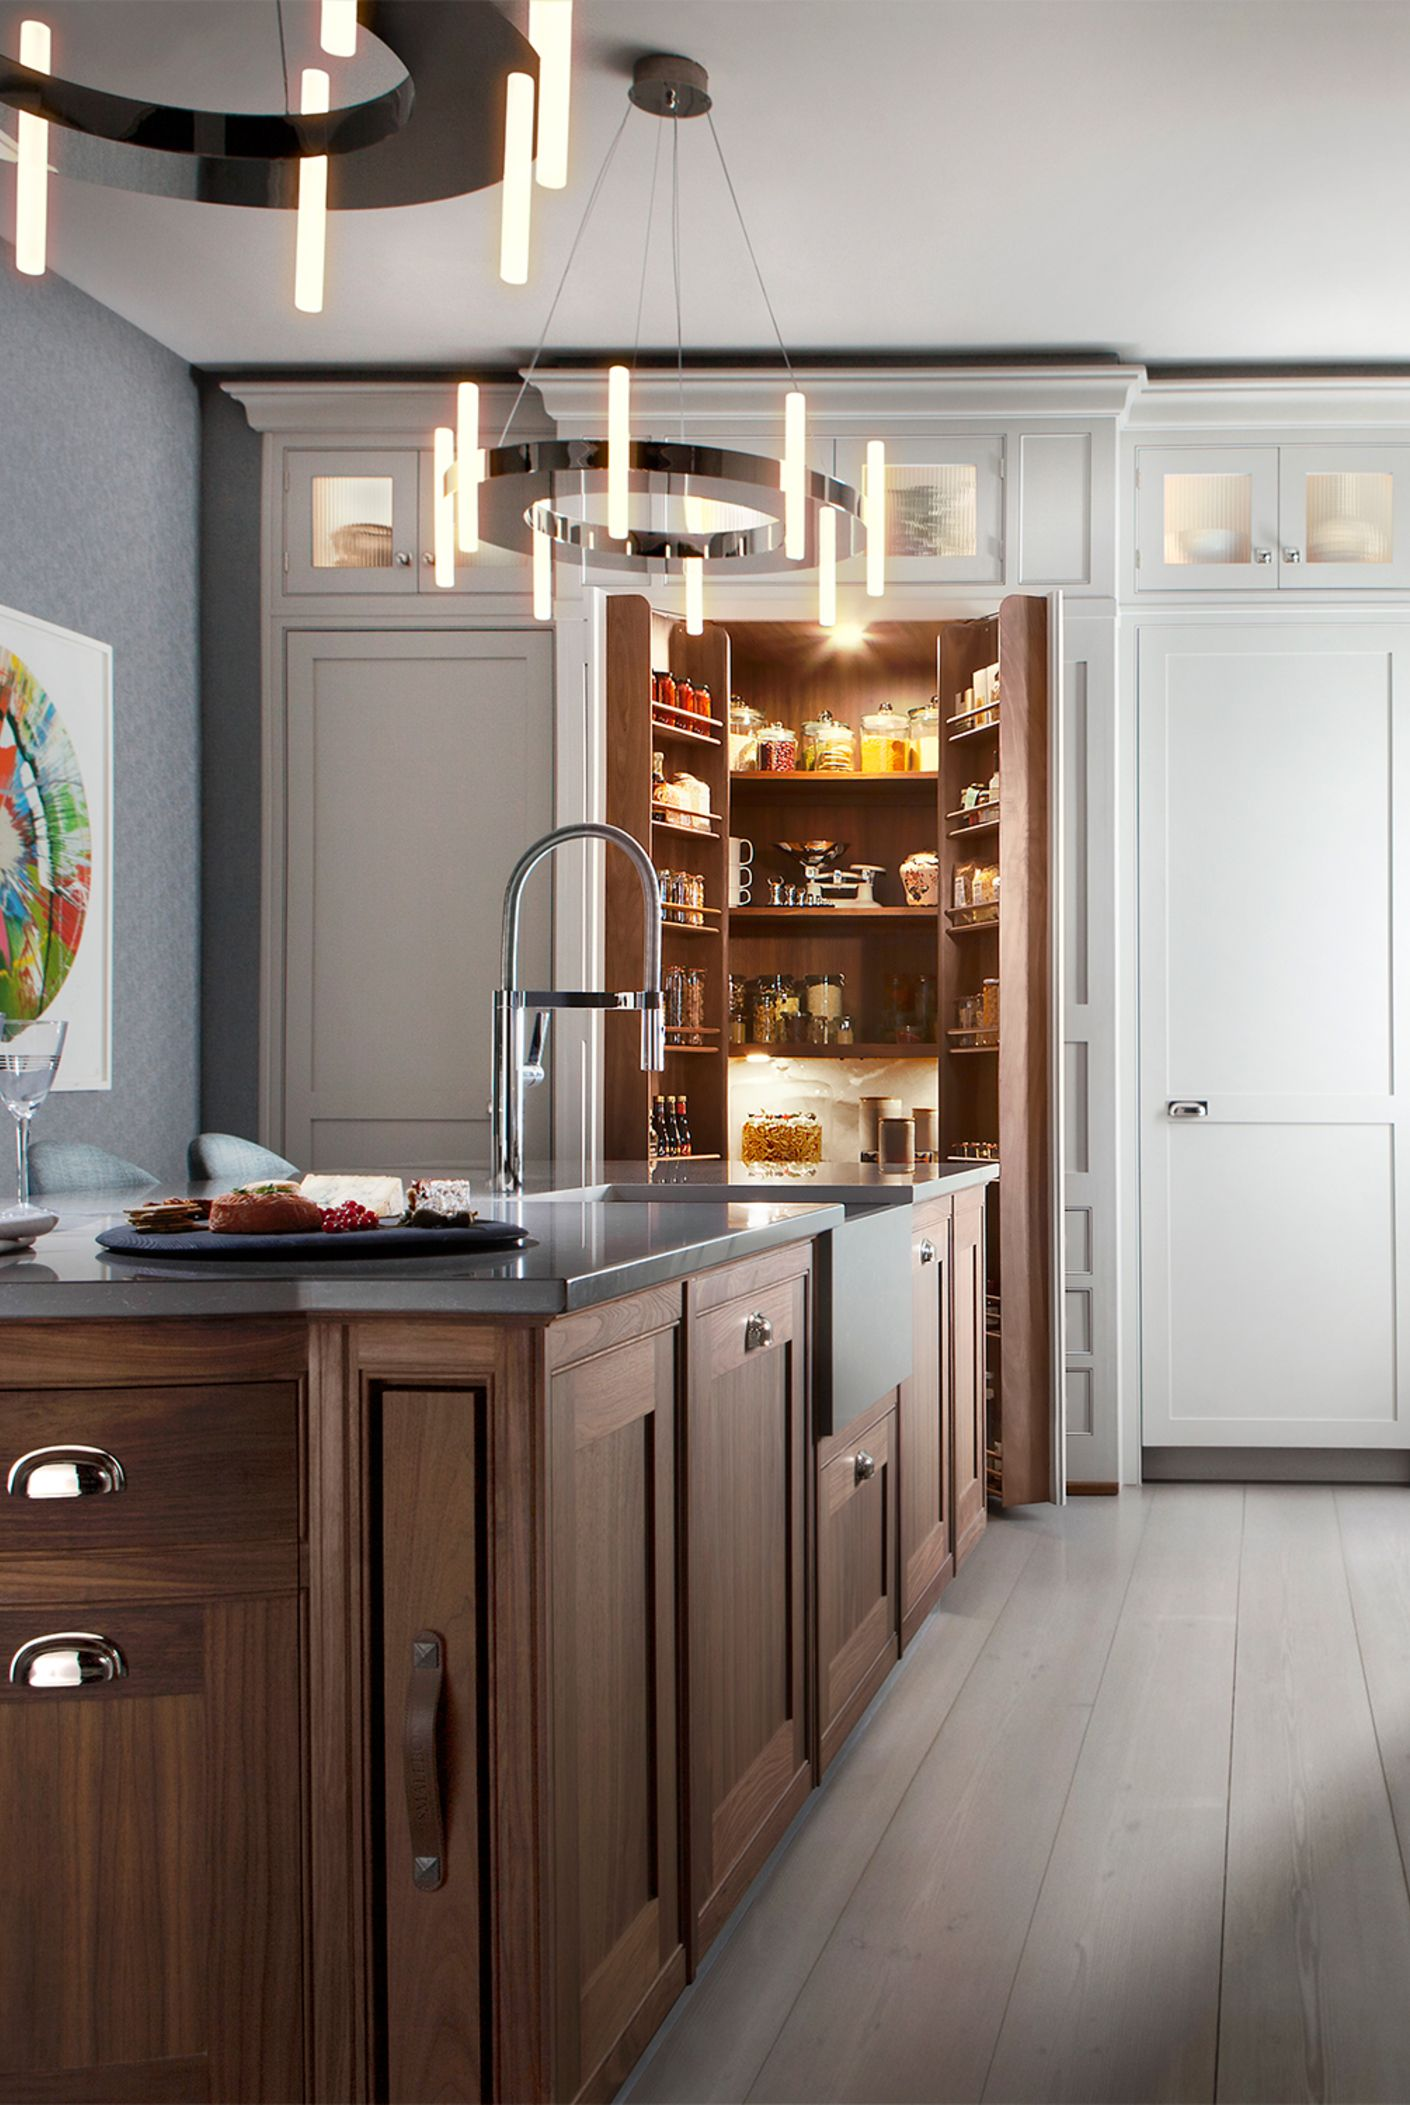 luxury British kitchen and pantry design. smallbone of